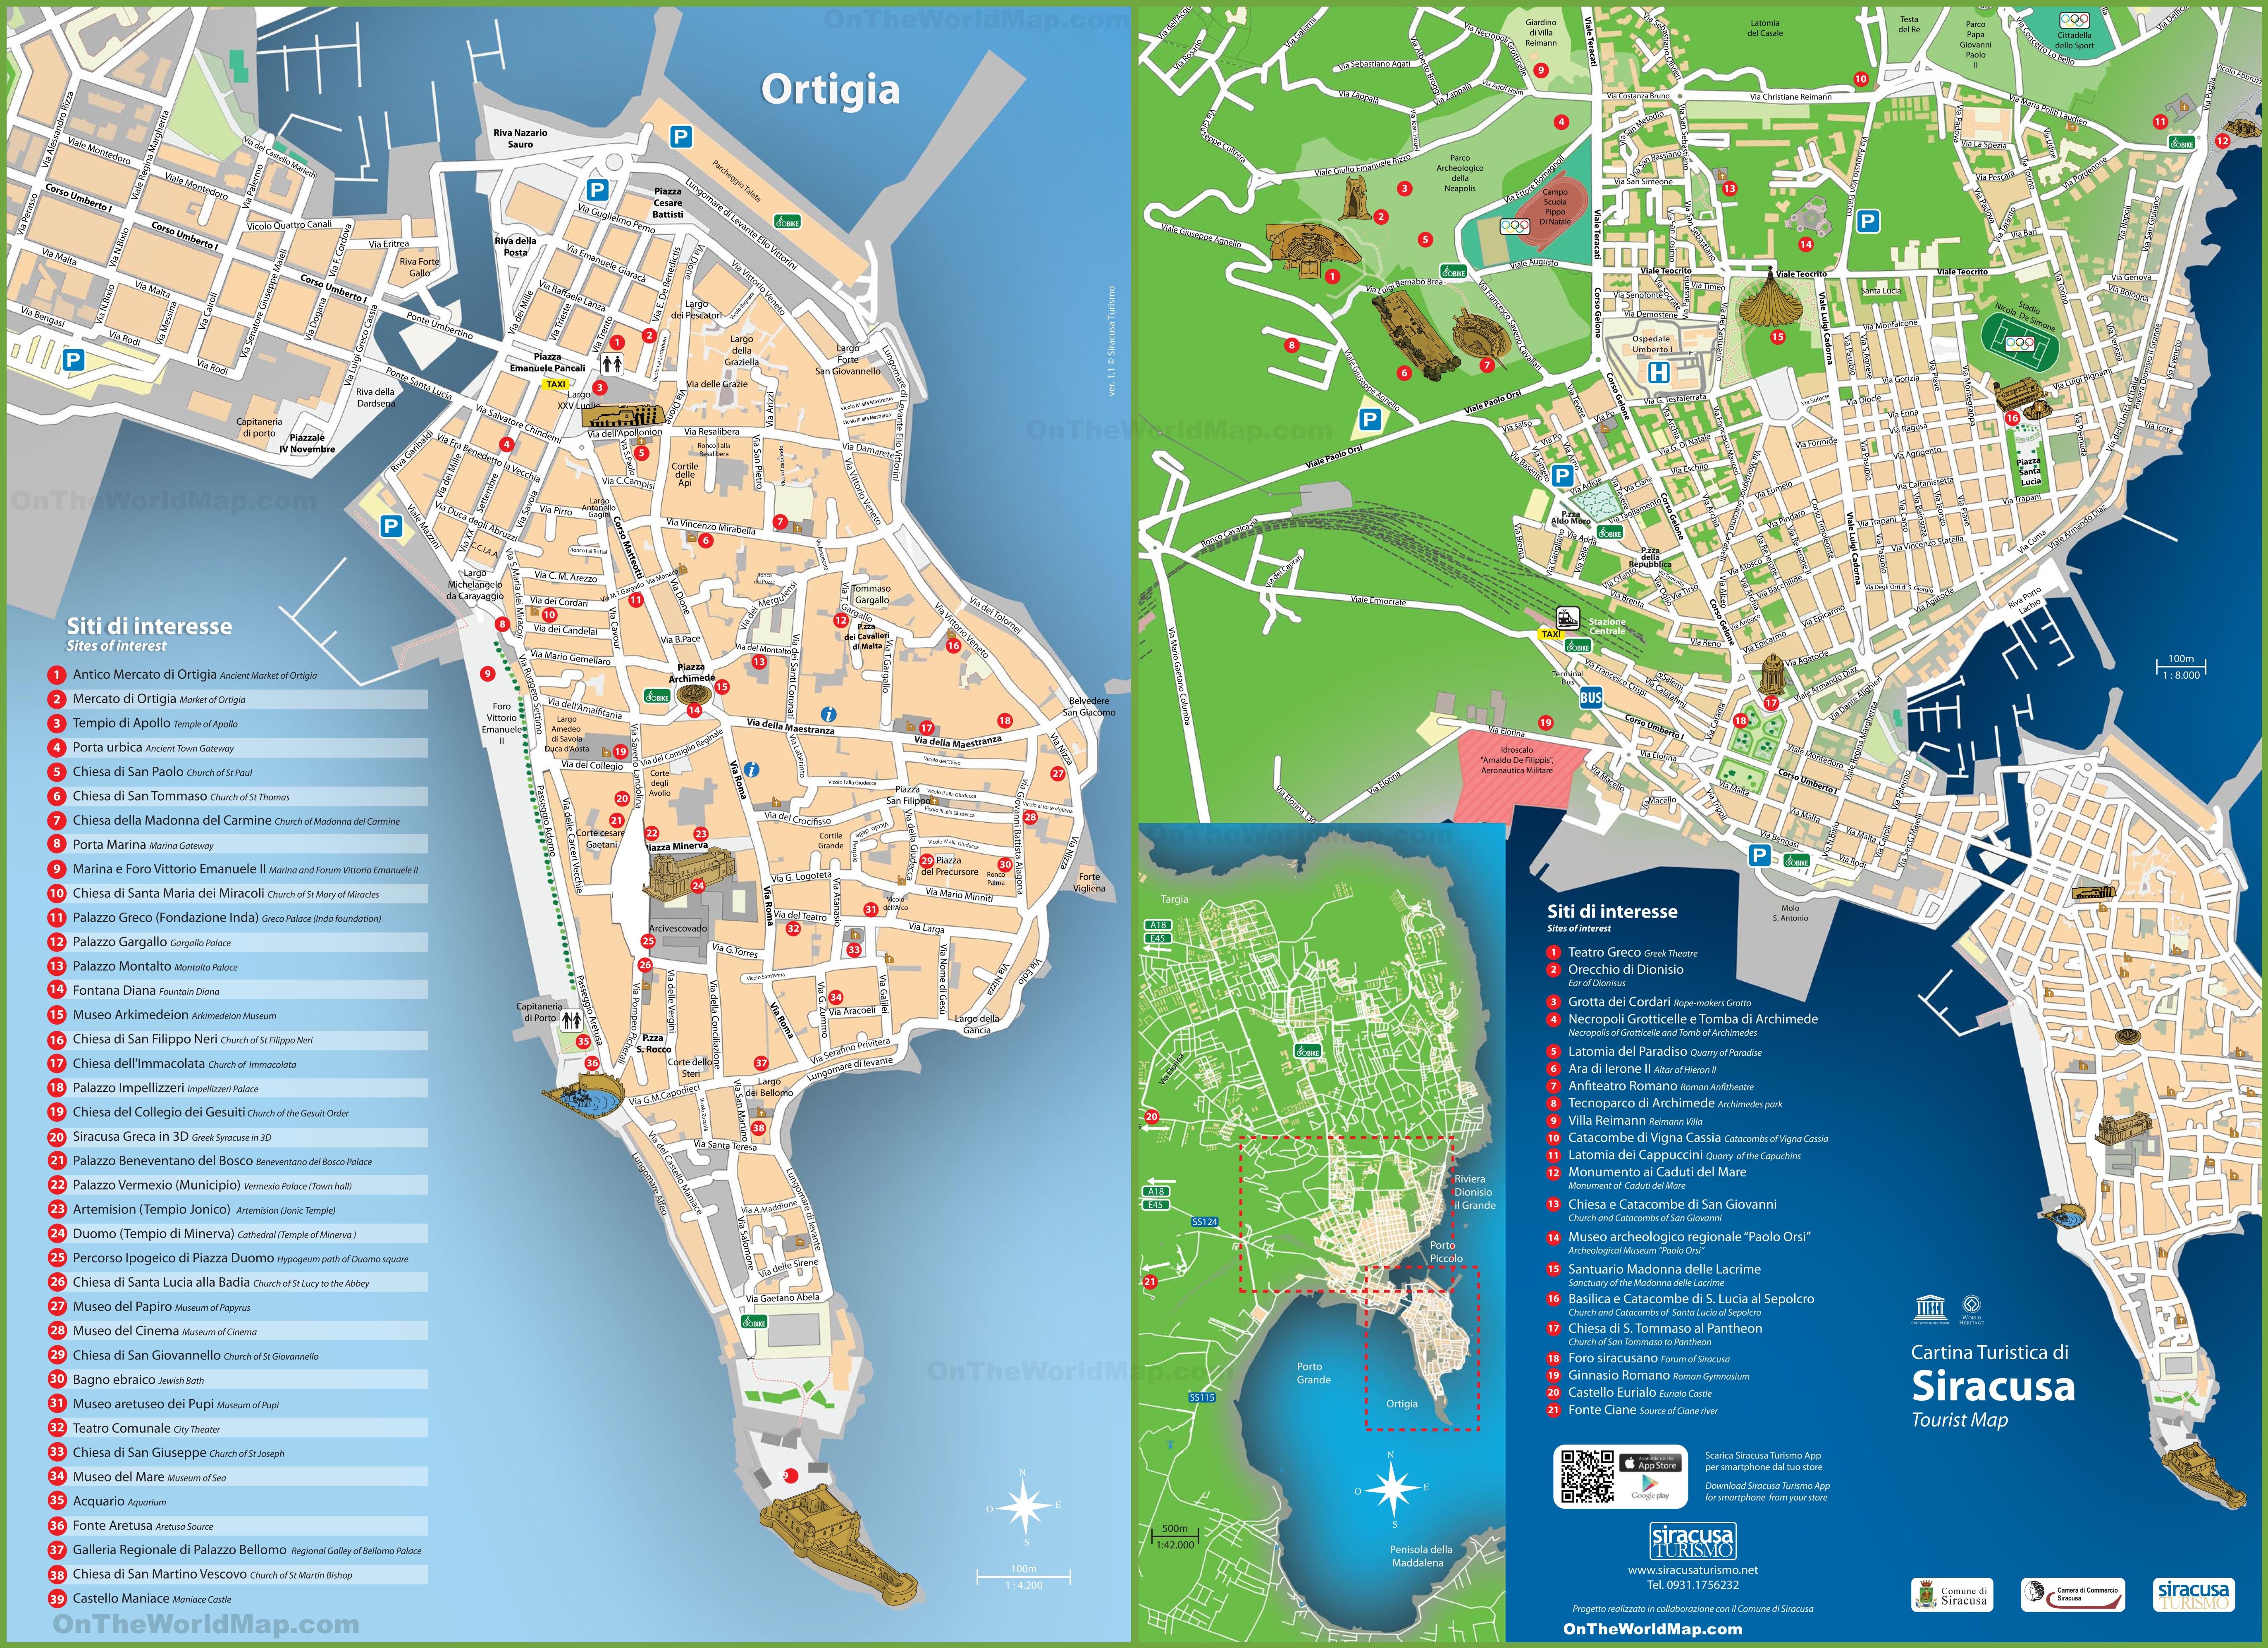 Syracuse Maps Sicily Italy Maps of Syracuse Siracusa